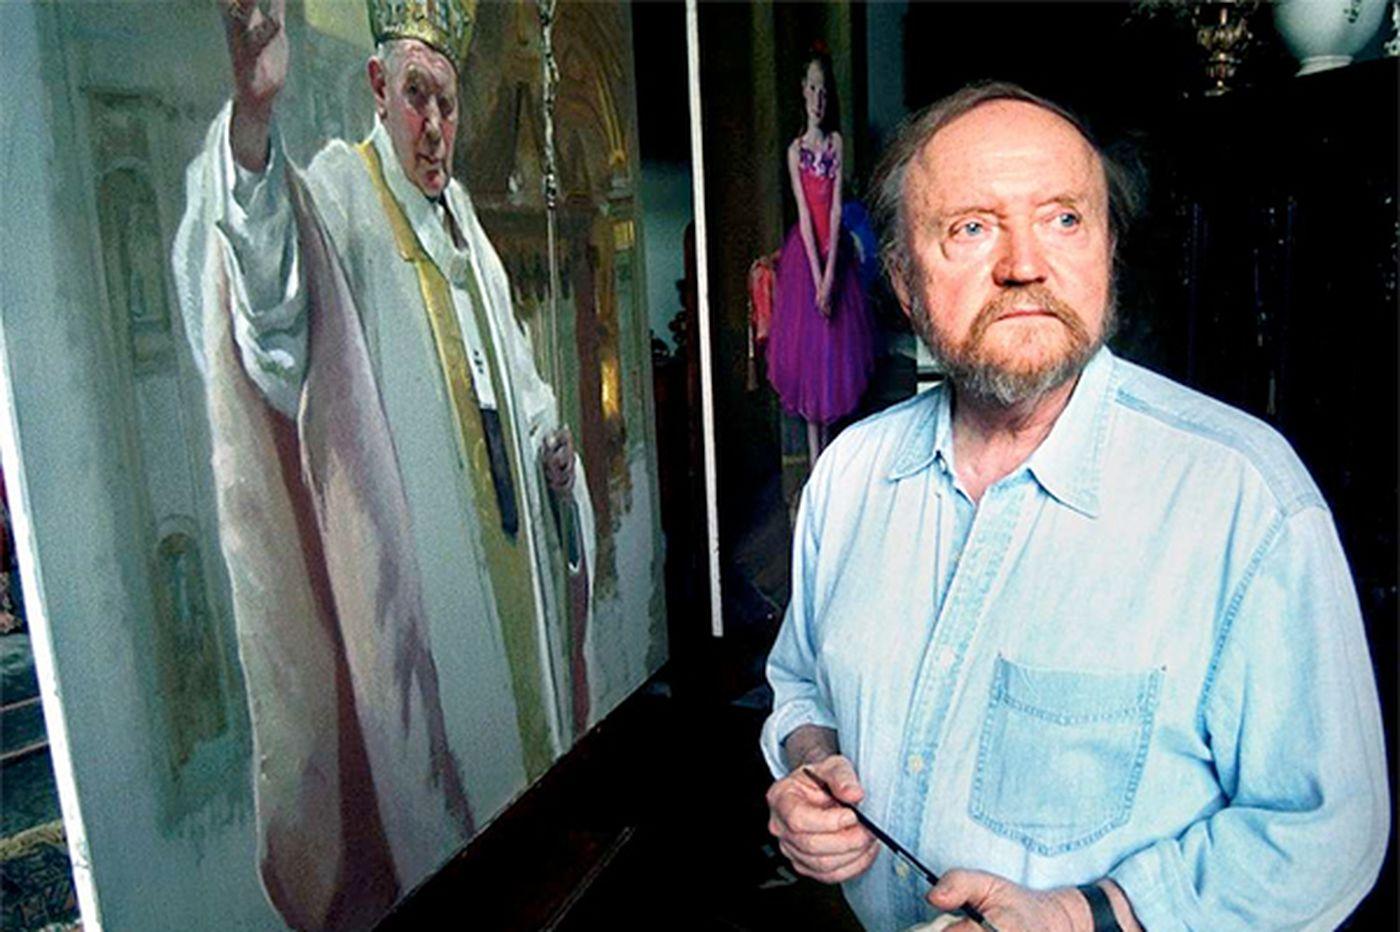 Nelson Shanks, renowned portrait artist, dead at 77